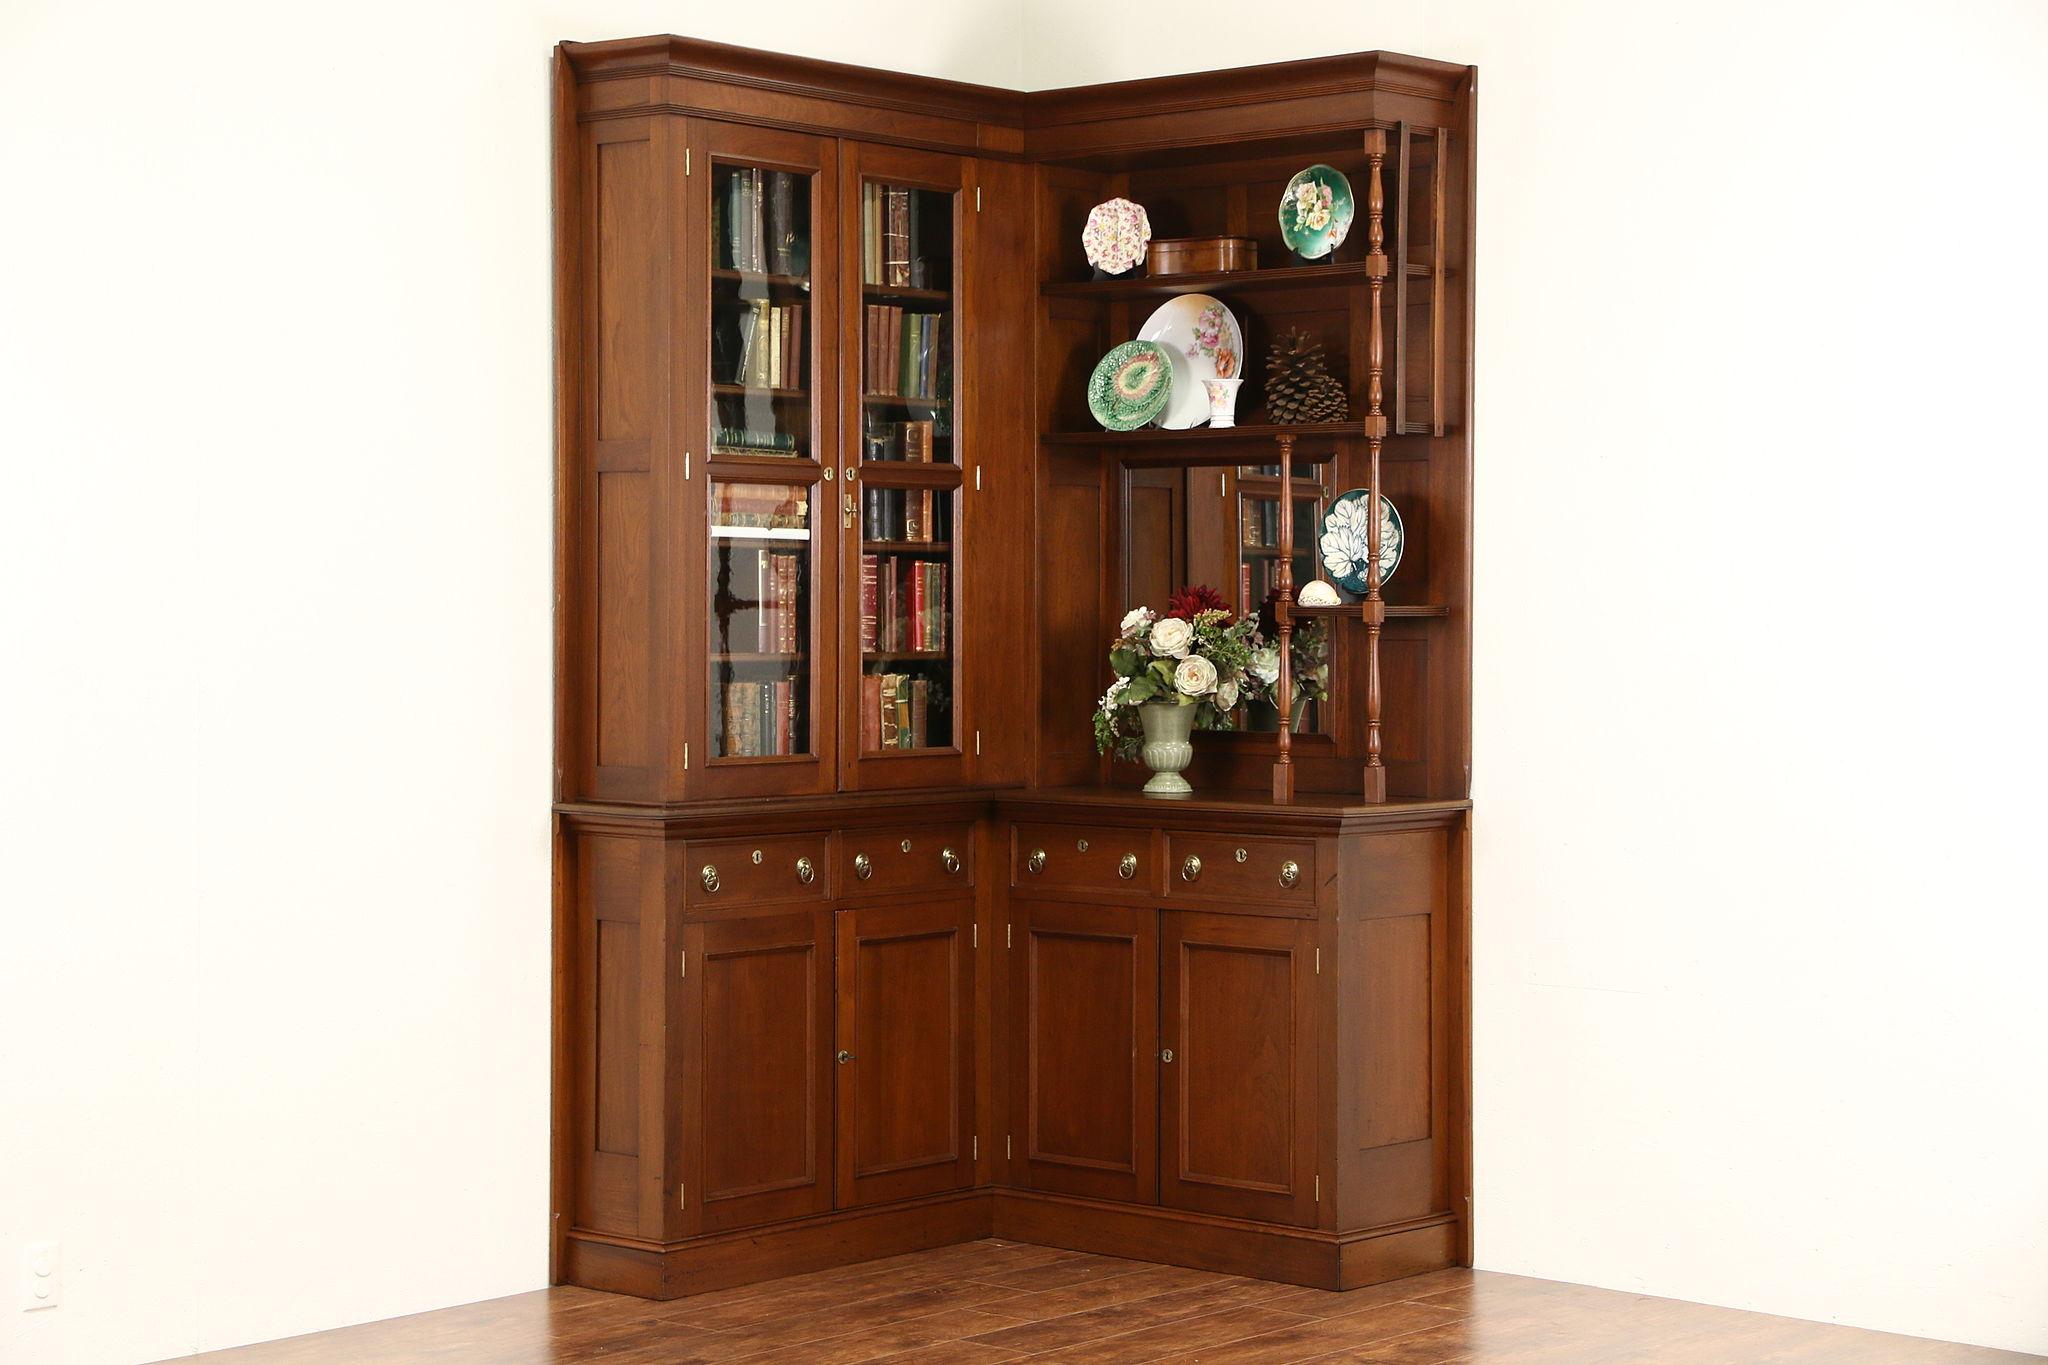 Victorian Eastlake Corner 1885 Antique Walnut Library Bookcase or ...